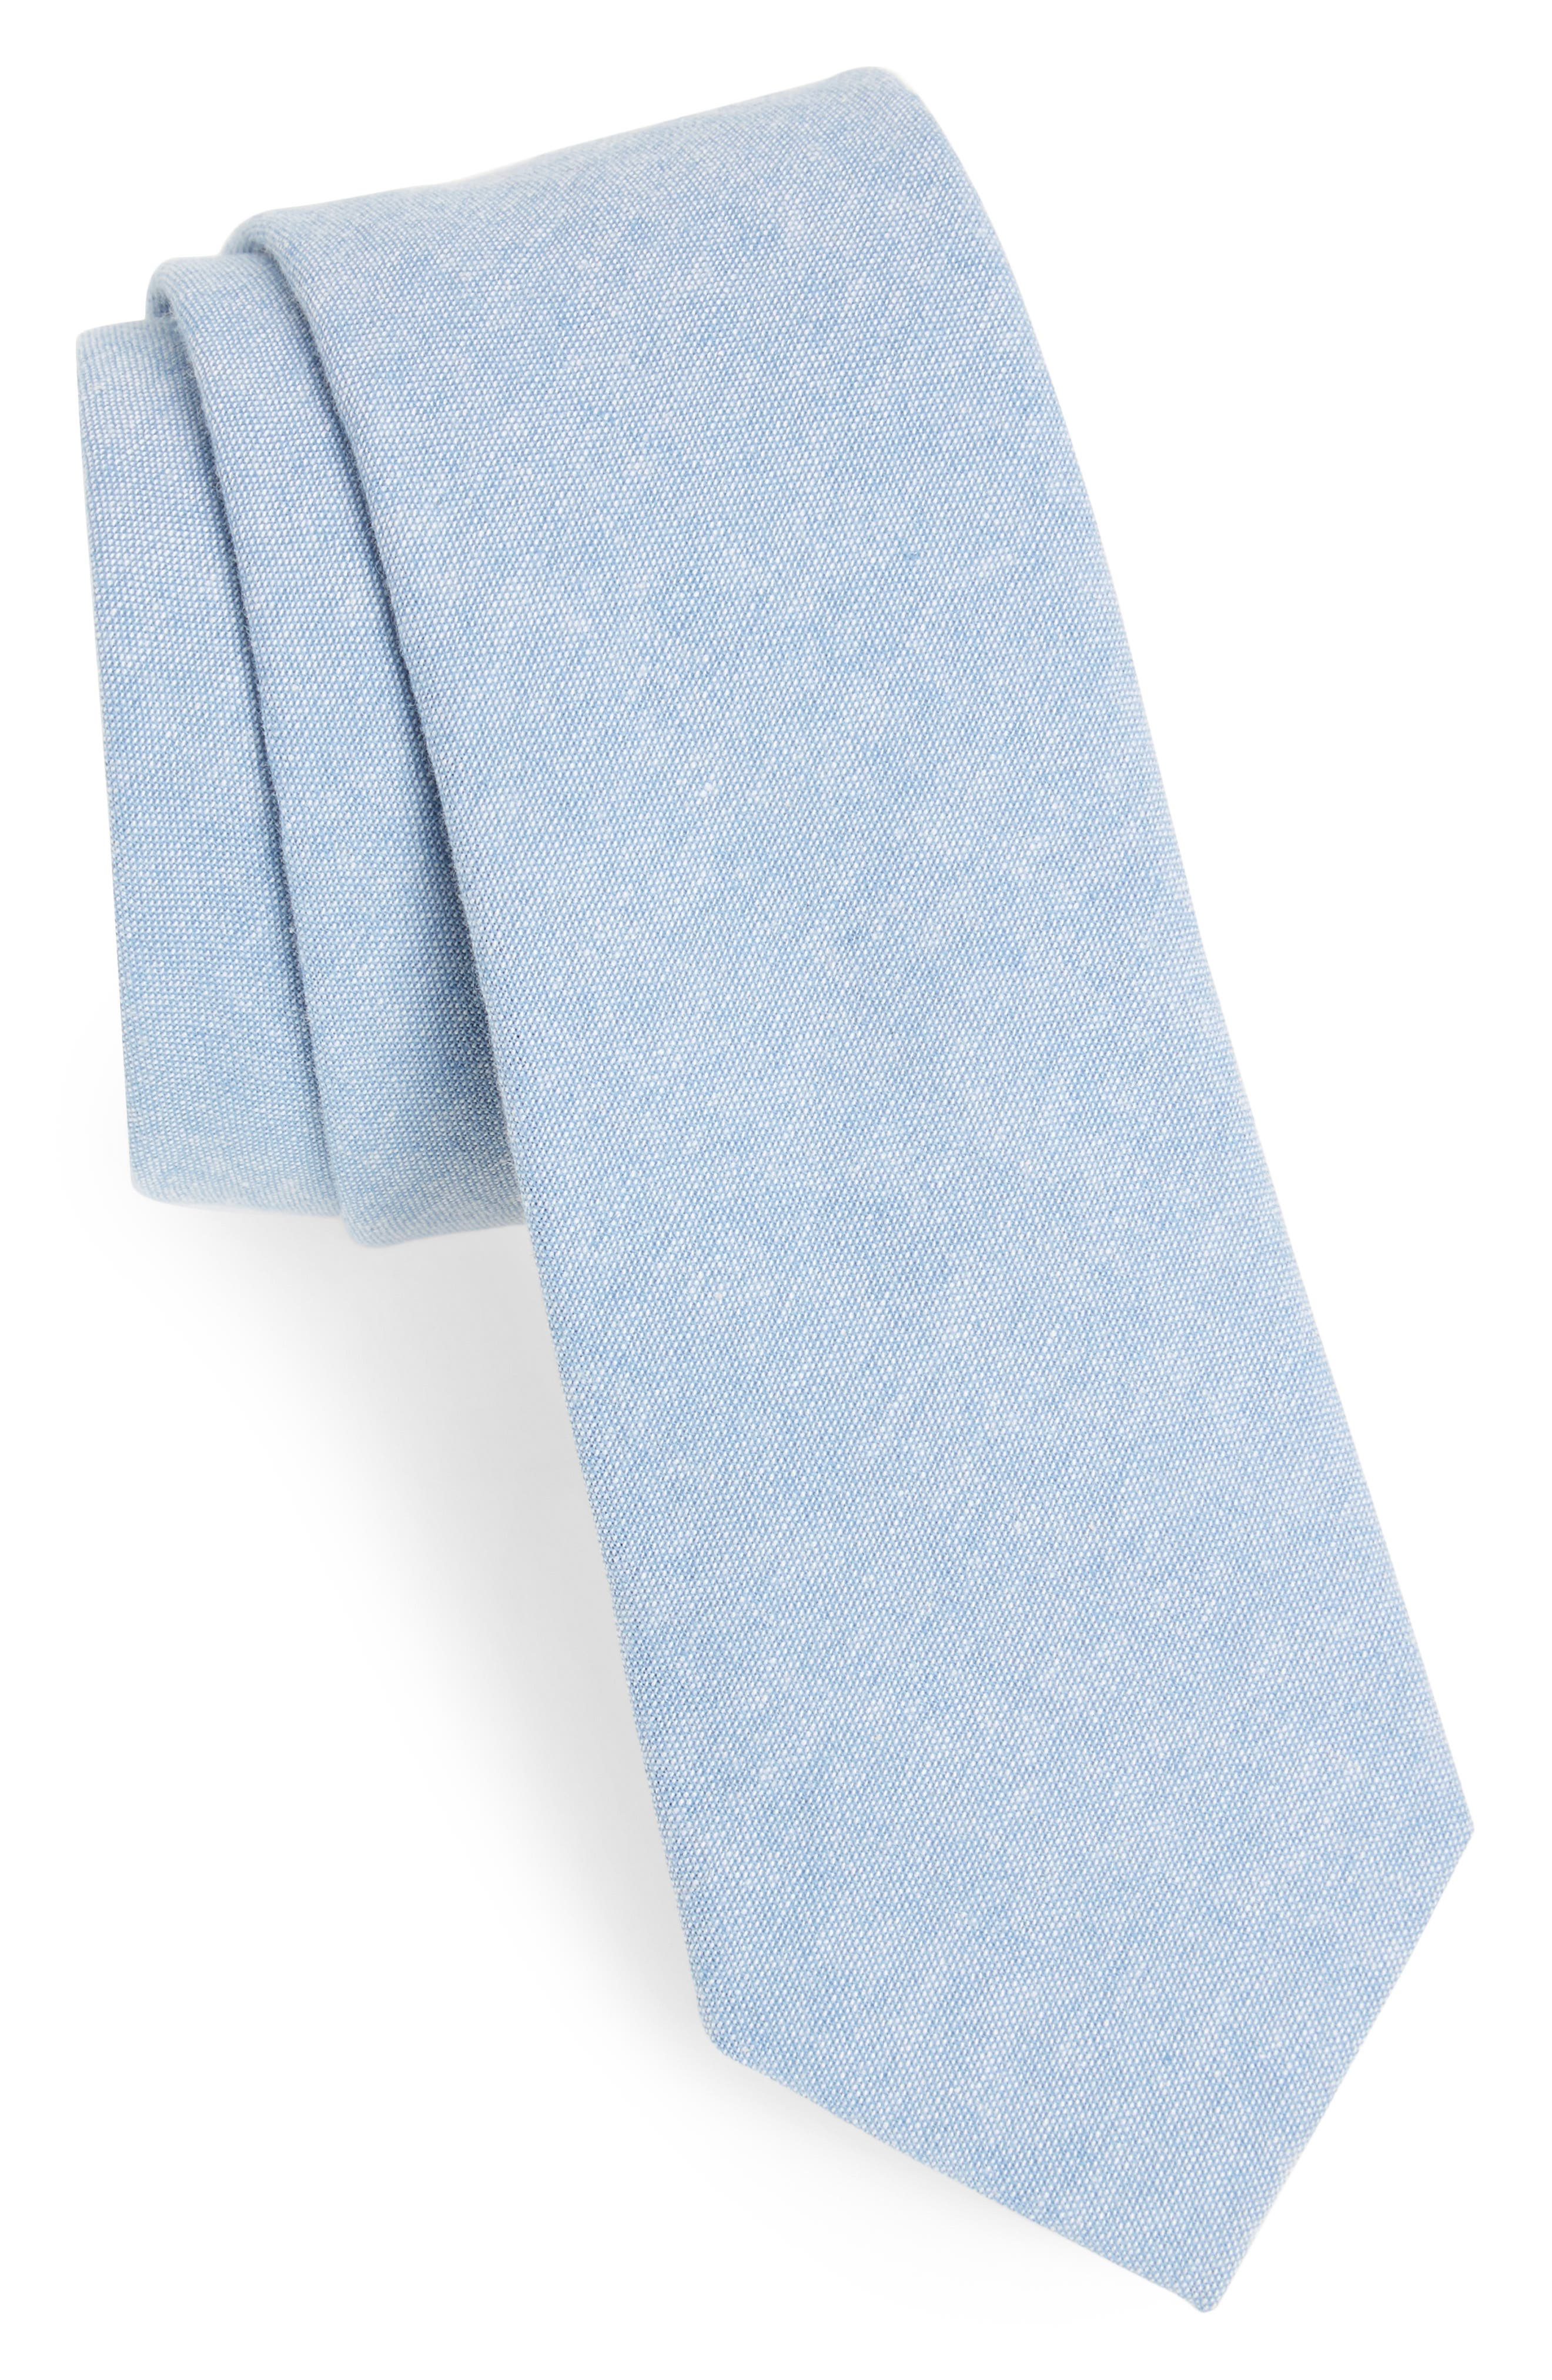 Laguna Solid Cotton Skinny Tie,                         Main,                         color, Blue